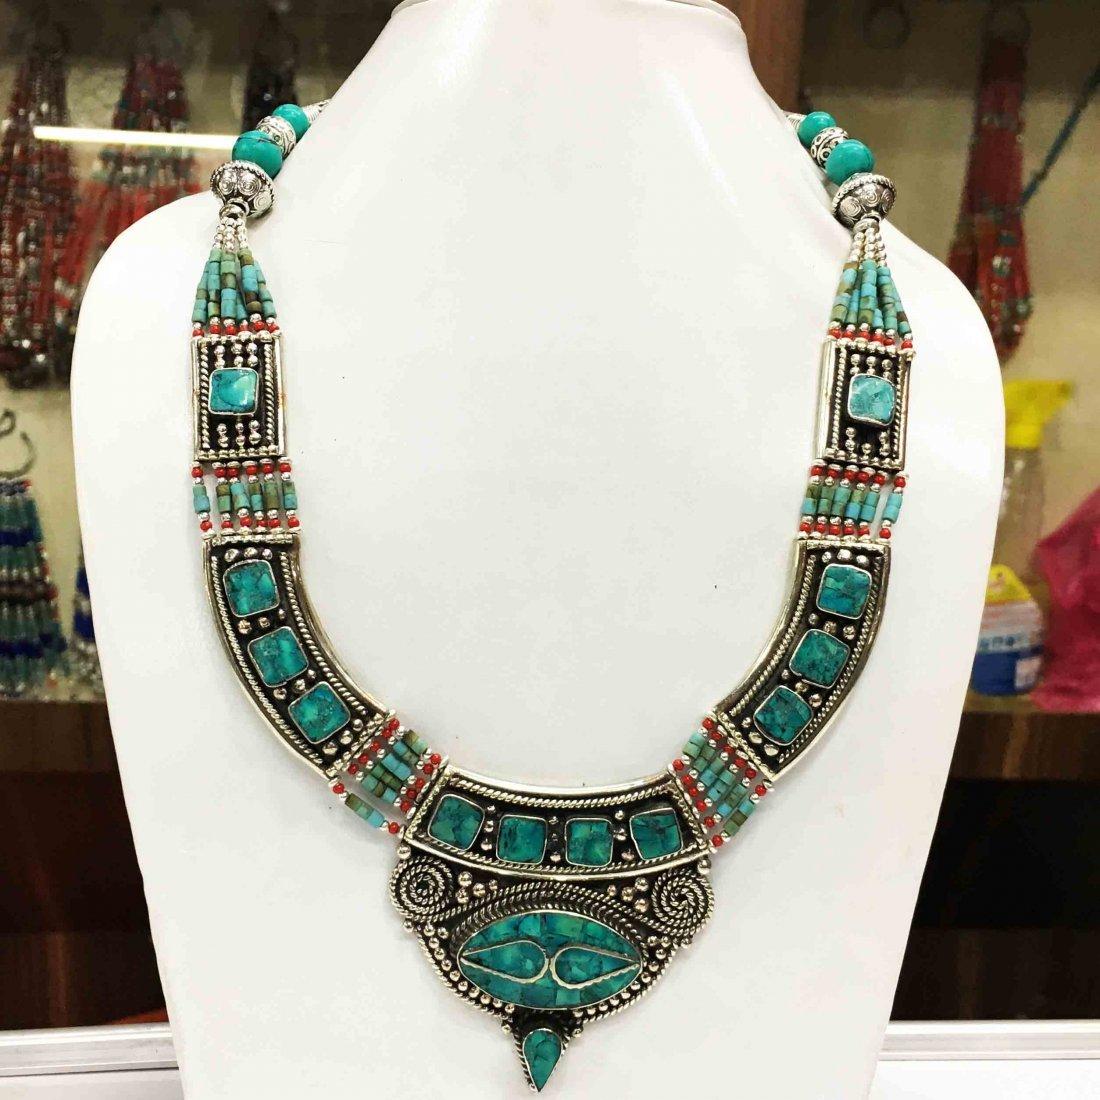 Nepalese Tribal & Ethnic Handmade Necklace